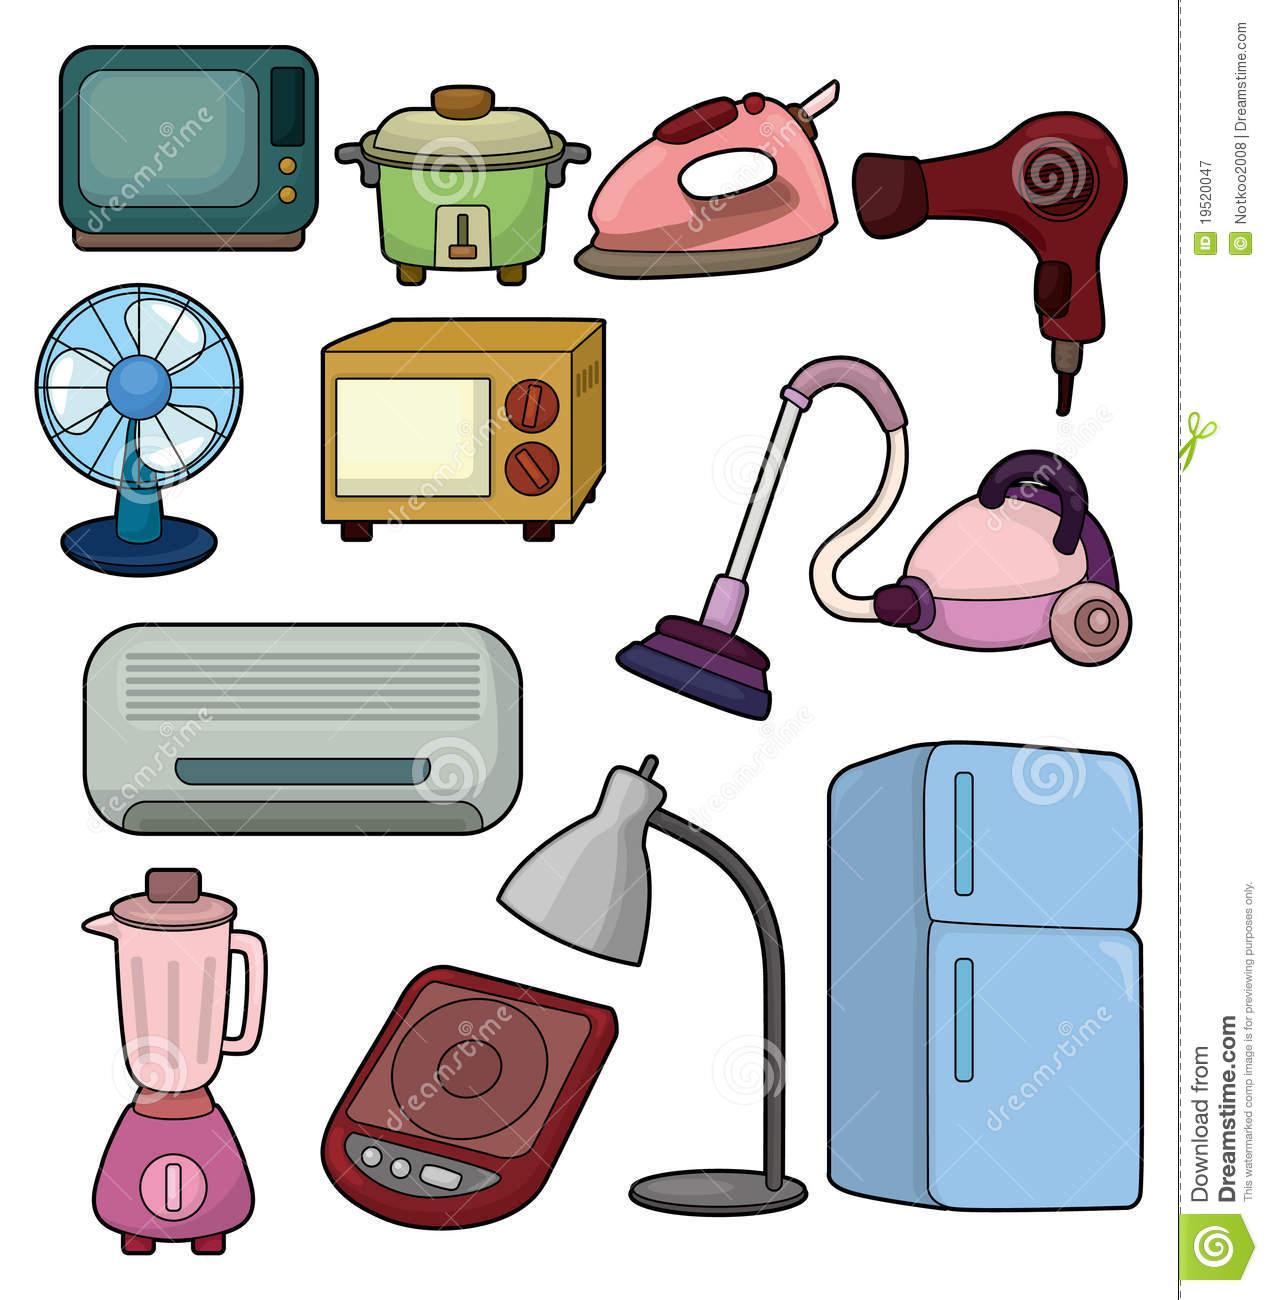 Electrical appliances clipart.